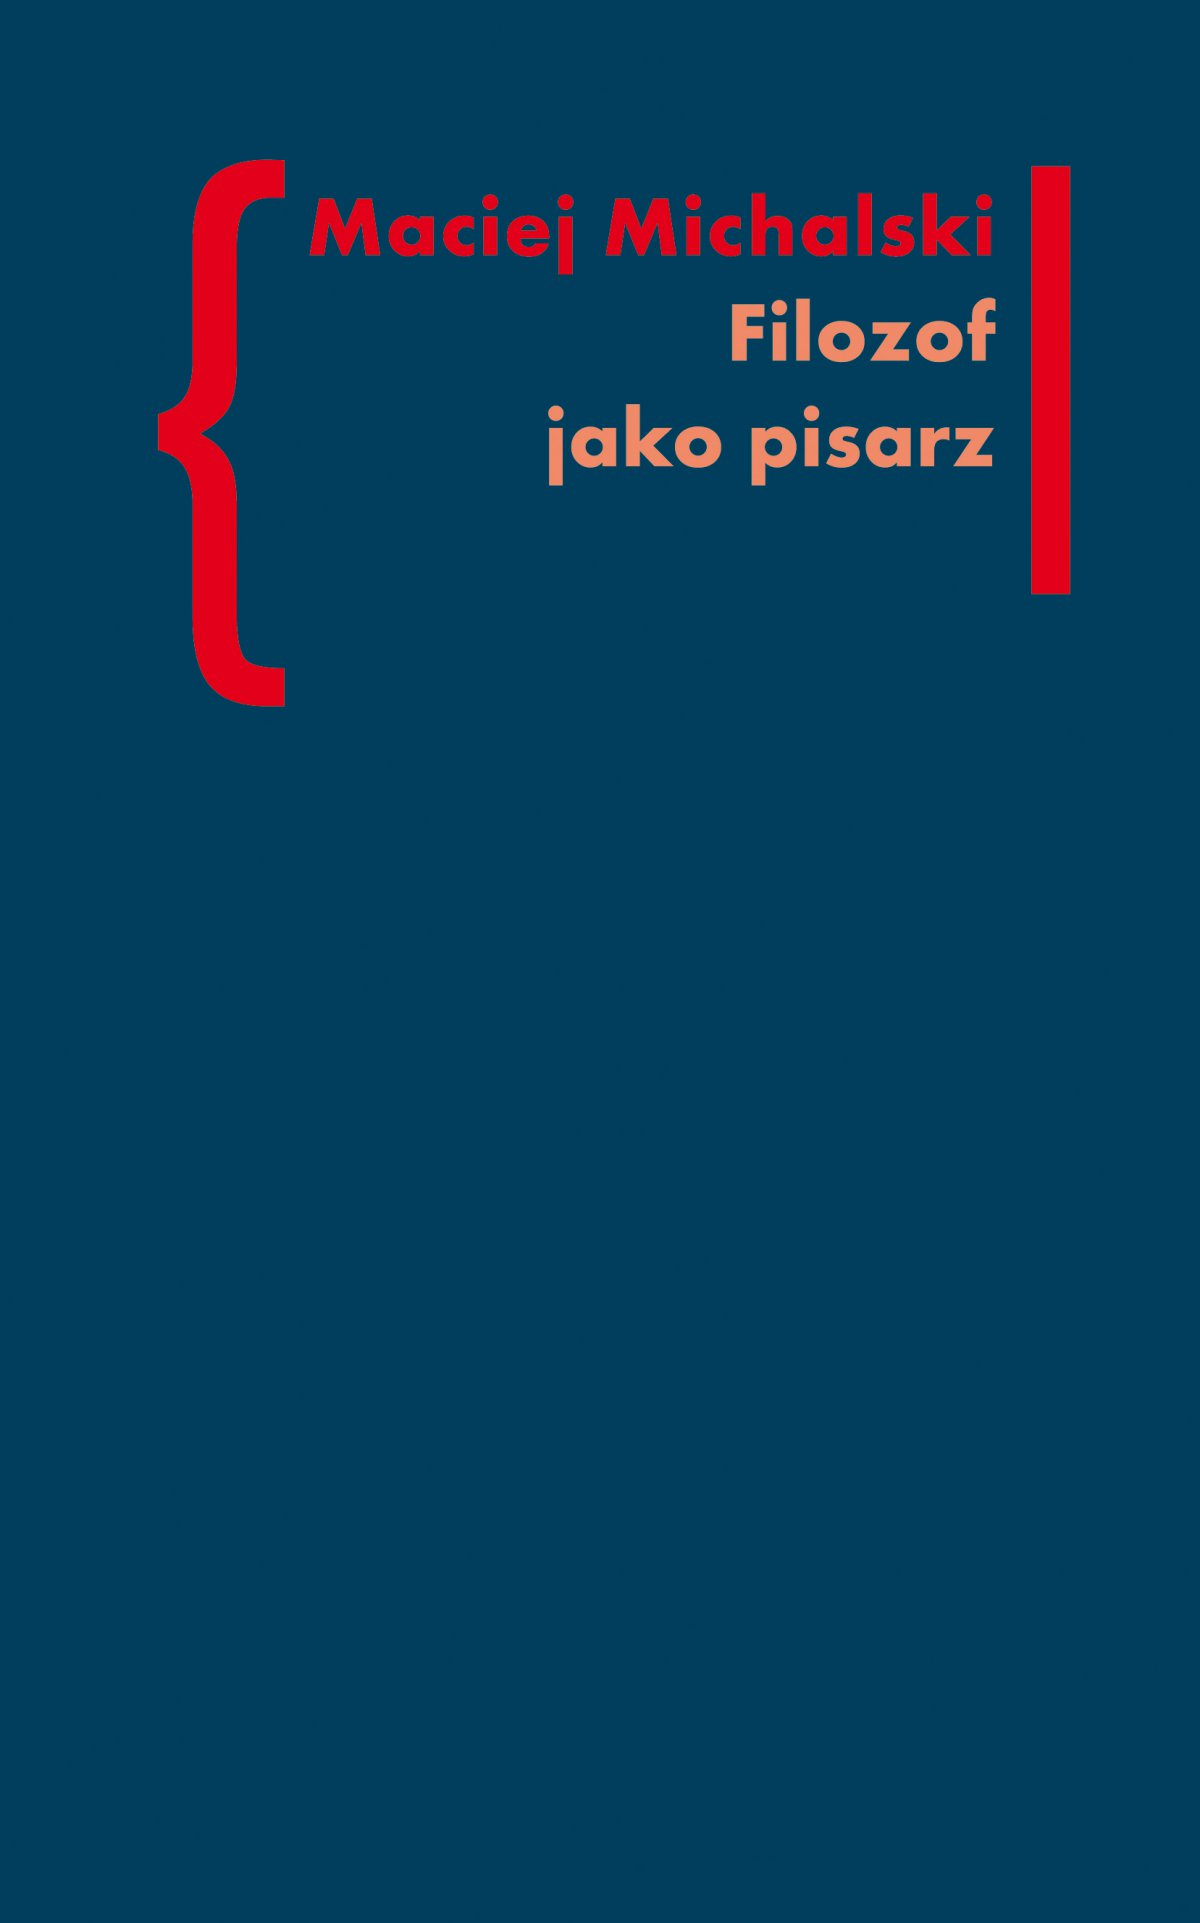 Filozof jako pisarz. Kołakowski - Skarga - Tischner - Ebook (Książka na Kindle) do pobrania w formacie MOBI